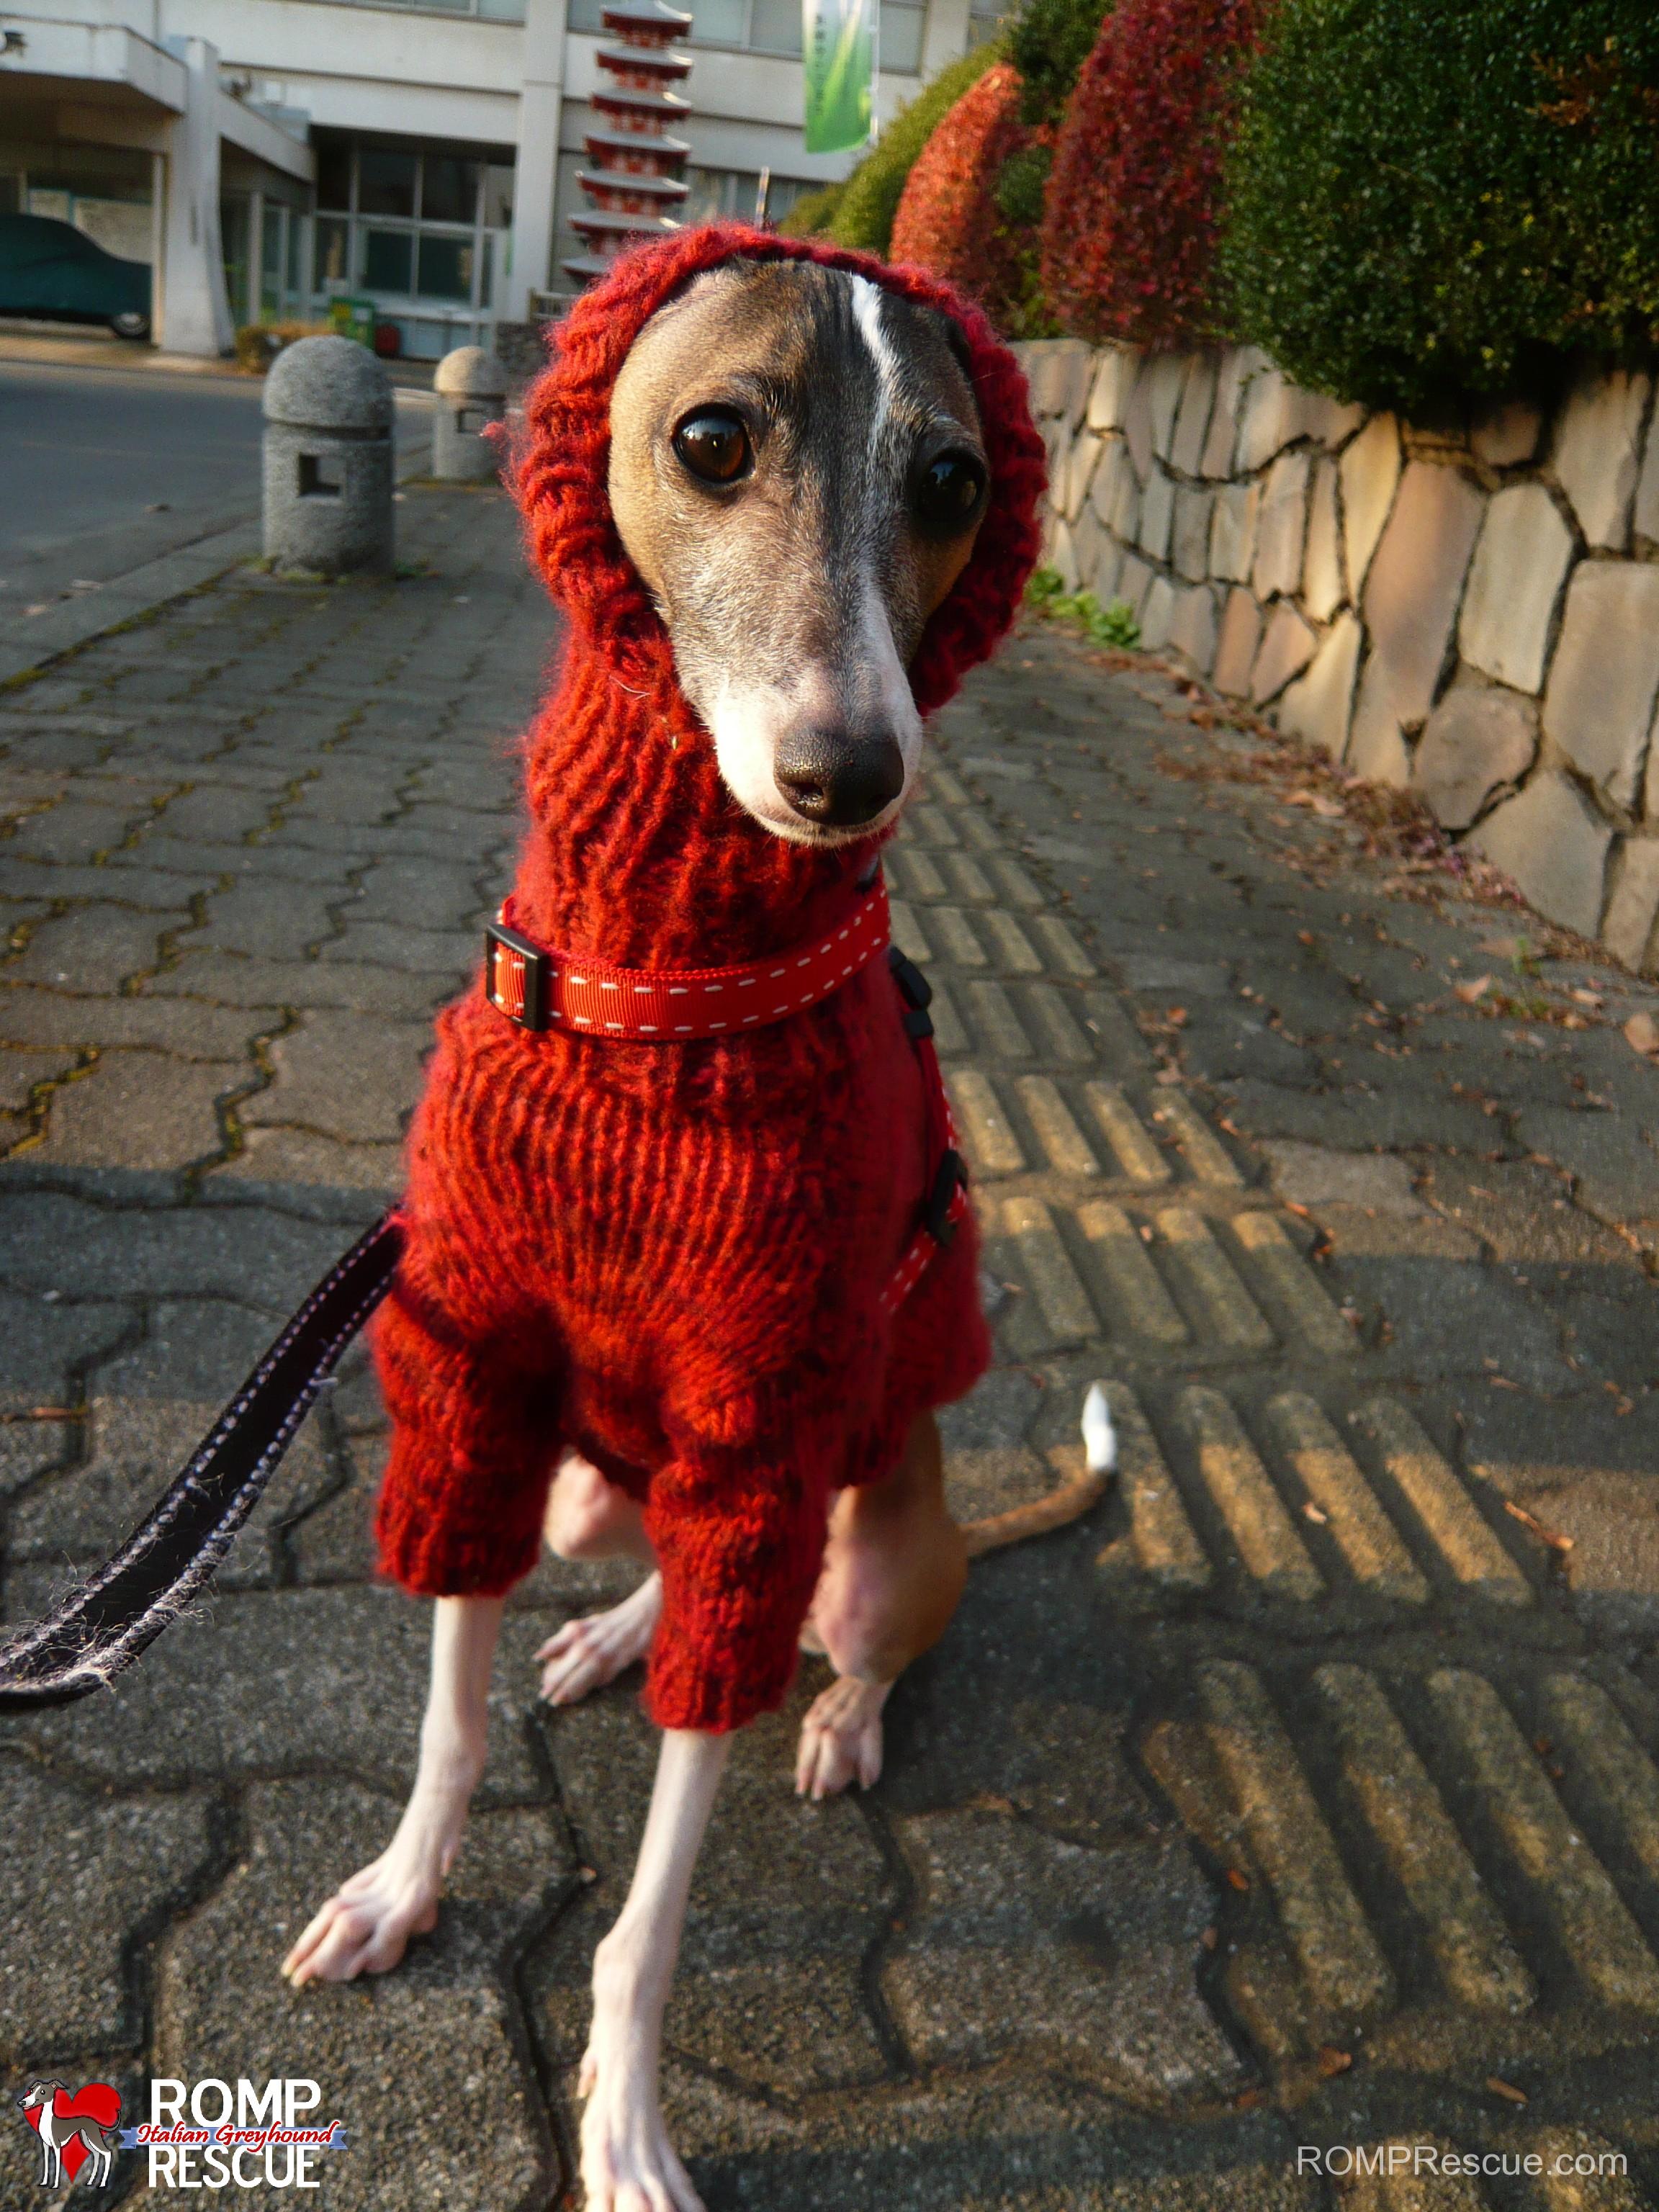 Italian Greyhounds wearing turtlenecks, Italian greyhound funny, funny italian greyhound, italian greyhound turtleneck, italian greyhound turtle neck, turttle neck italian greyhound, turtleneck, turtle neck, italian greyhound, italian, greyhound